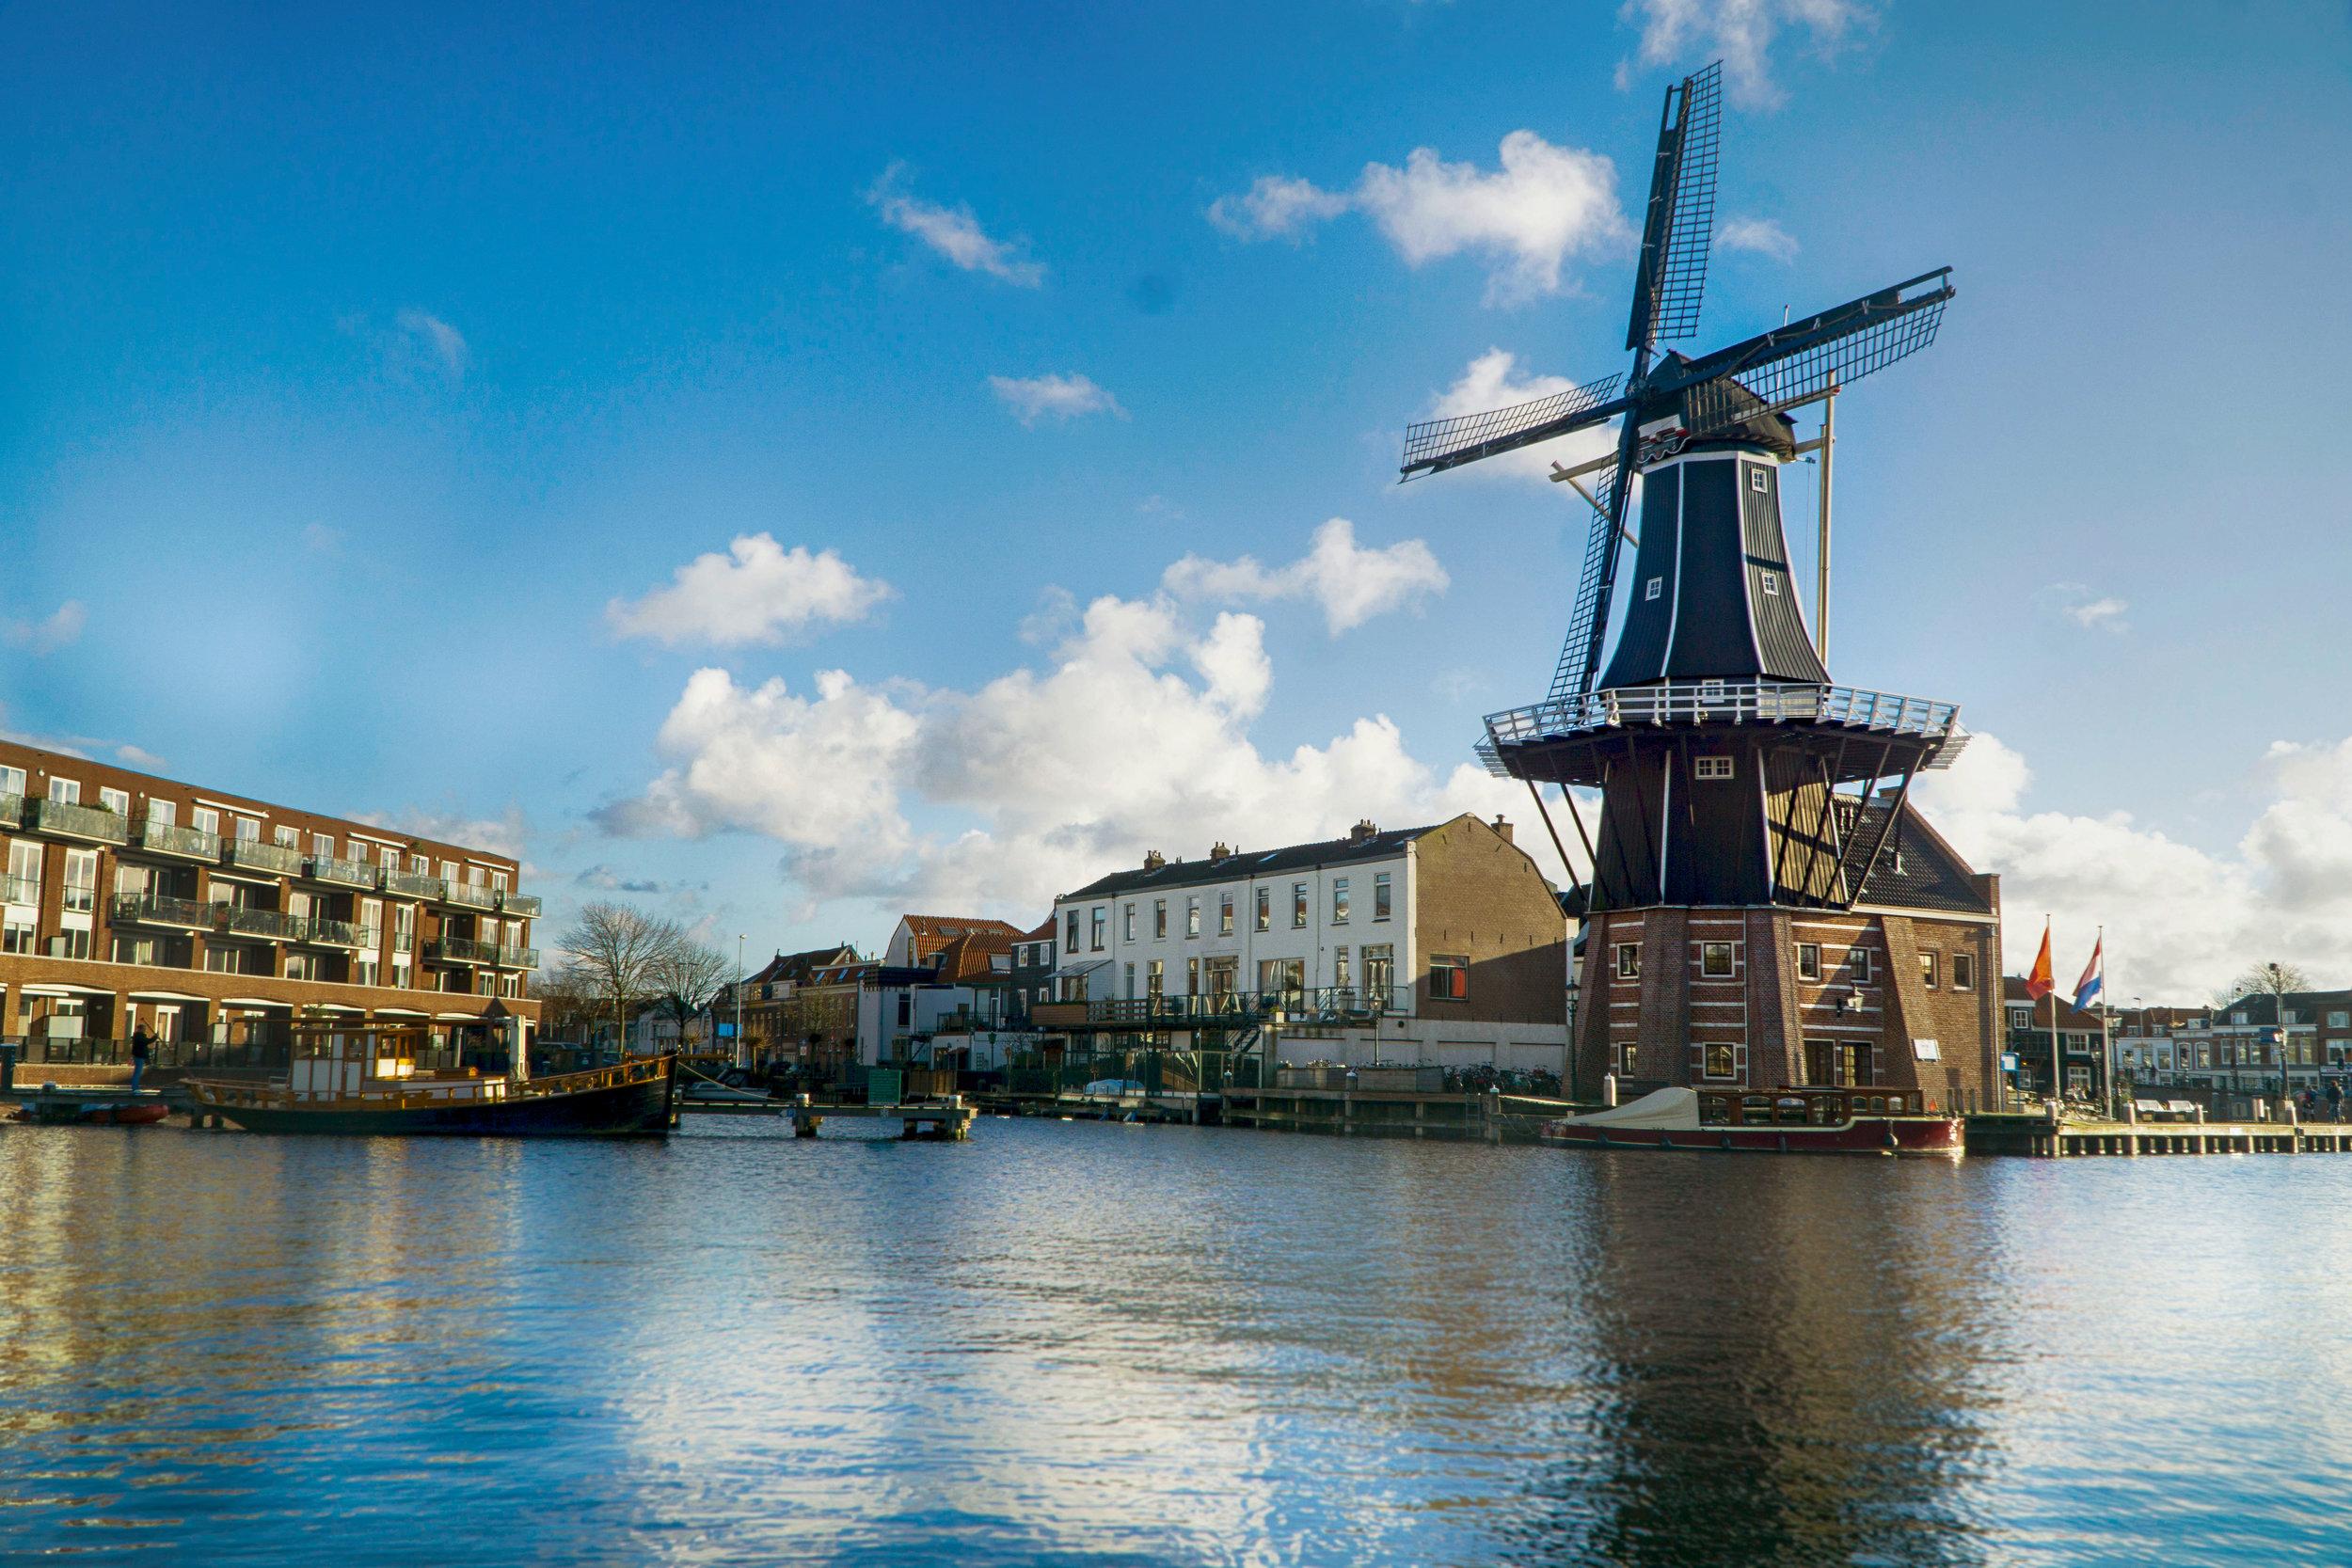 Holland_theNetherlands_vickygood_travel_photography_sm.jpg